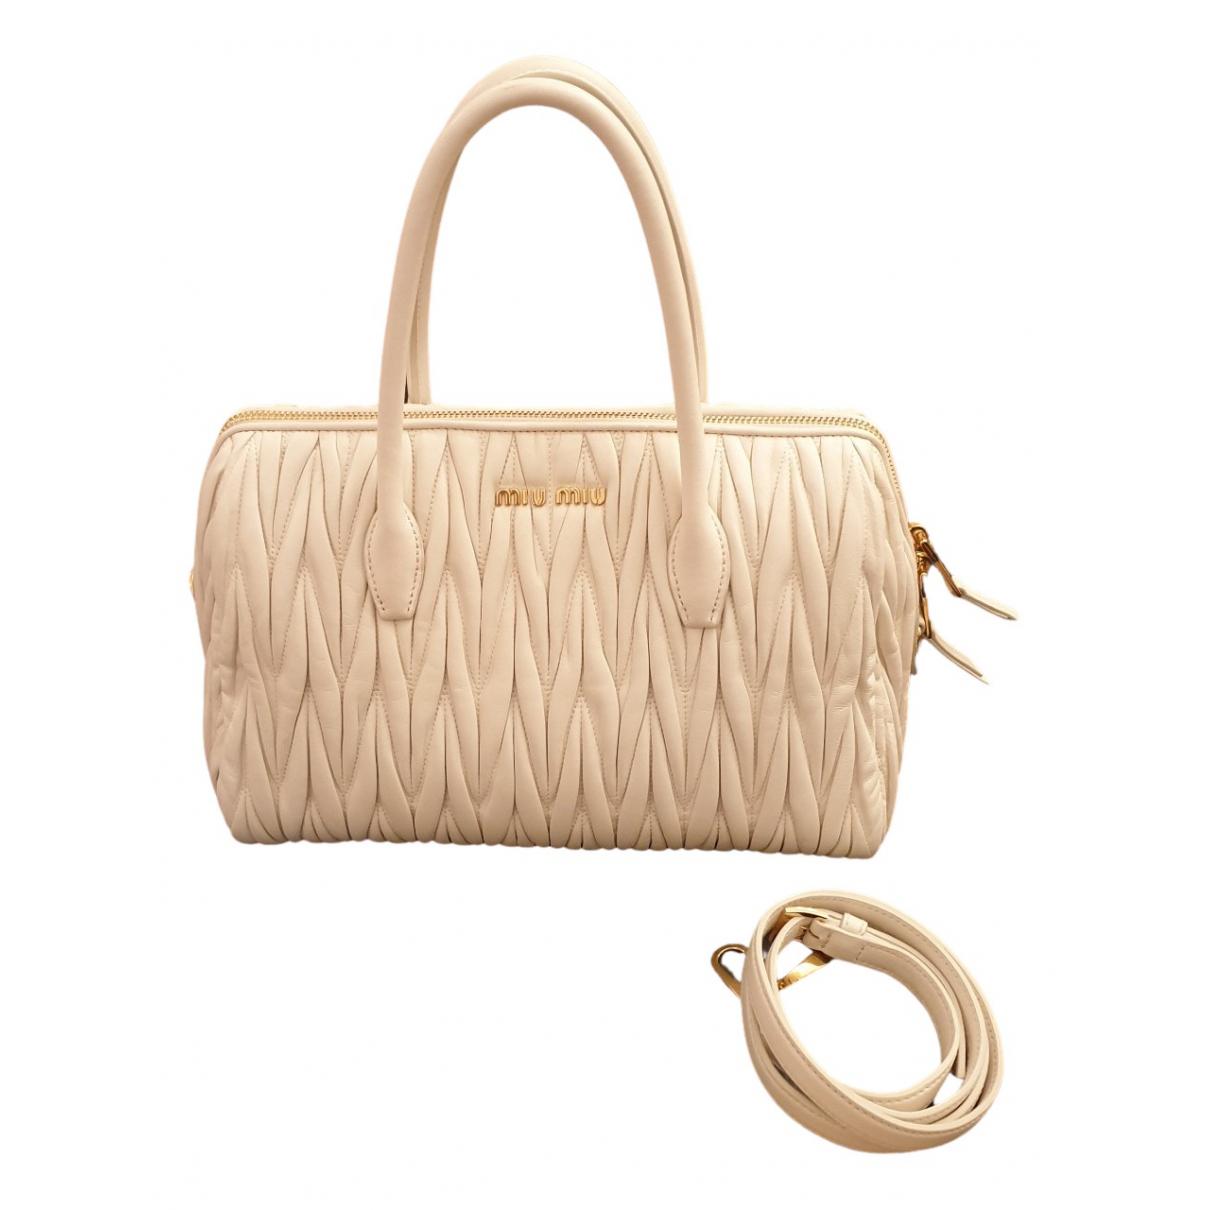 Miu Miu \N Handtasche in  Weiss Leder